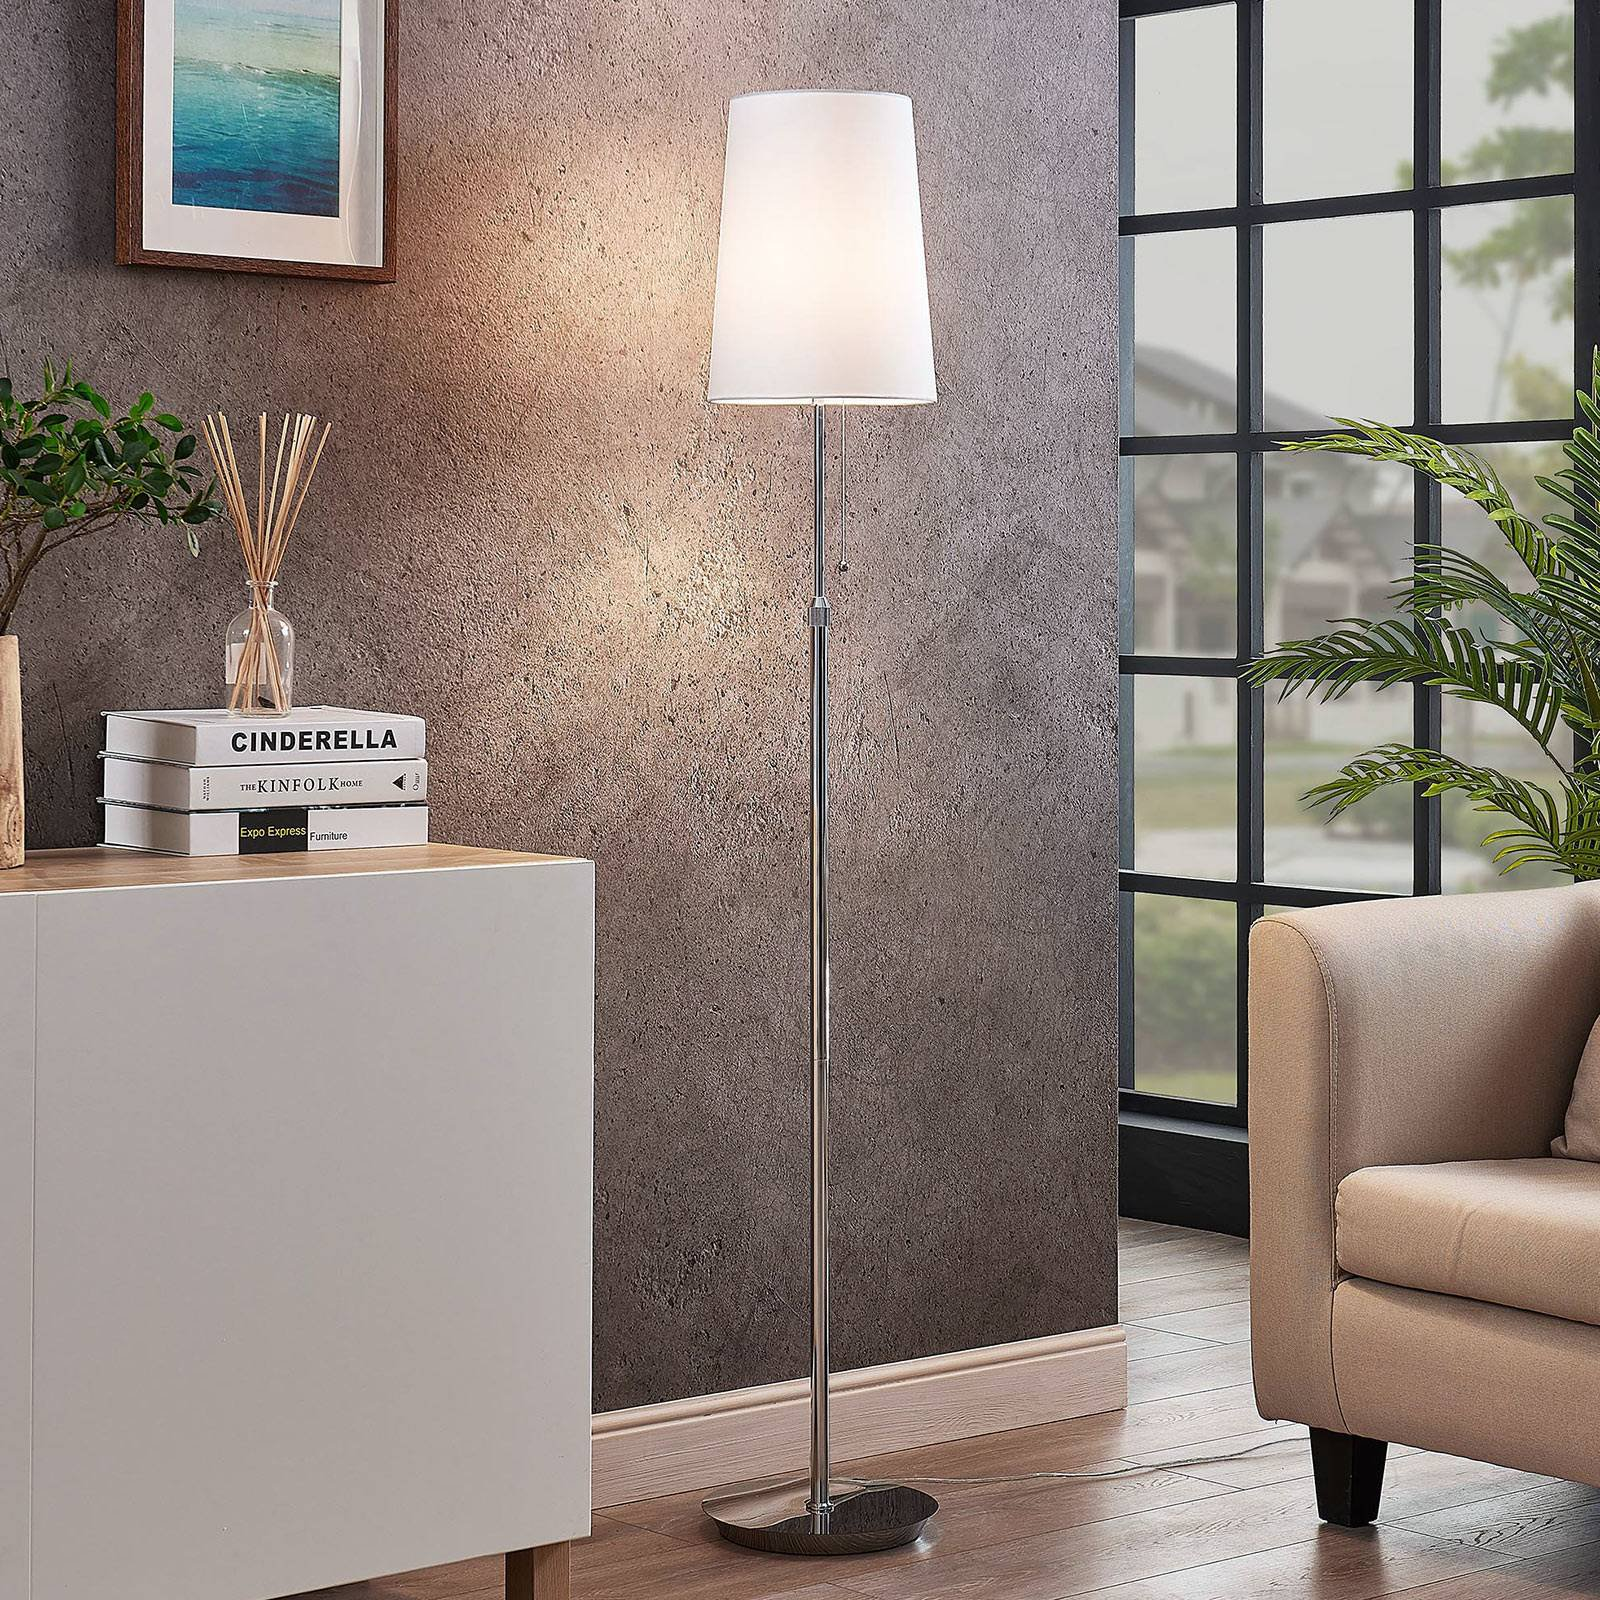 Lucande Pordis gulvlampe, 164 cm, krom-hvit